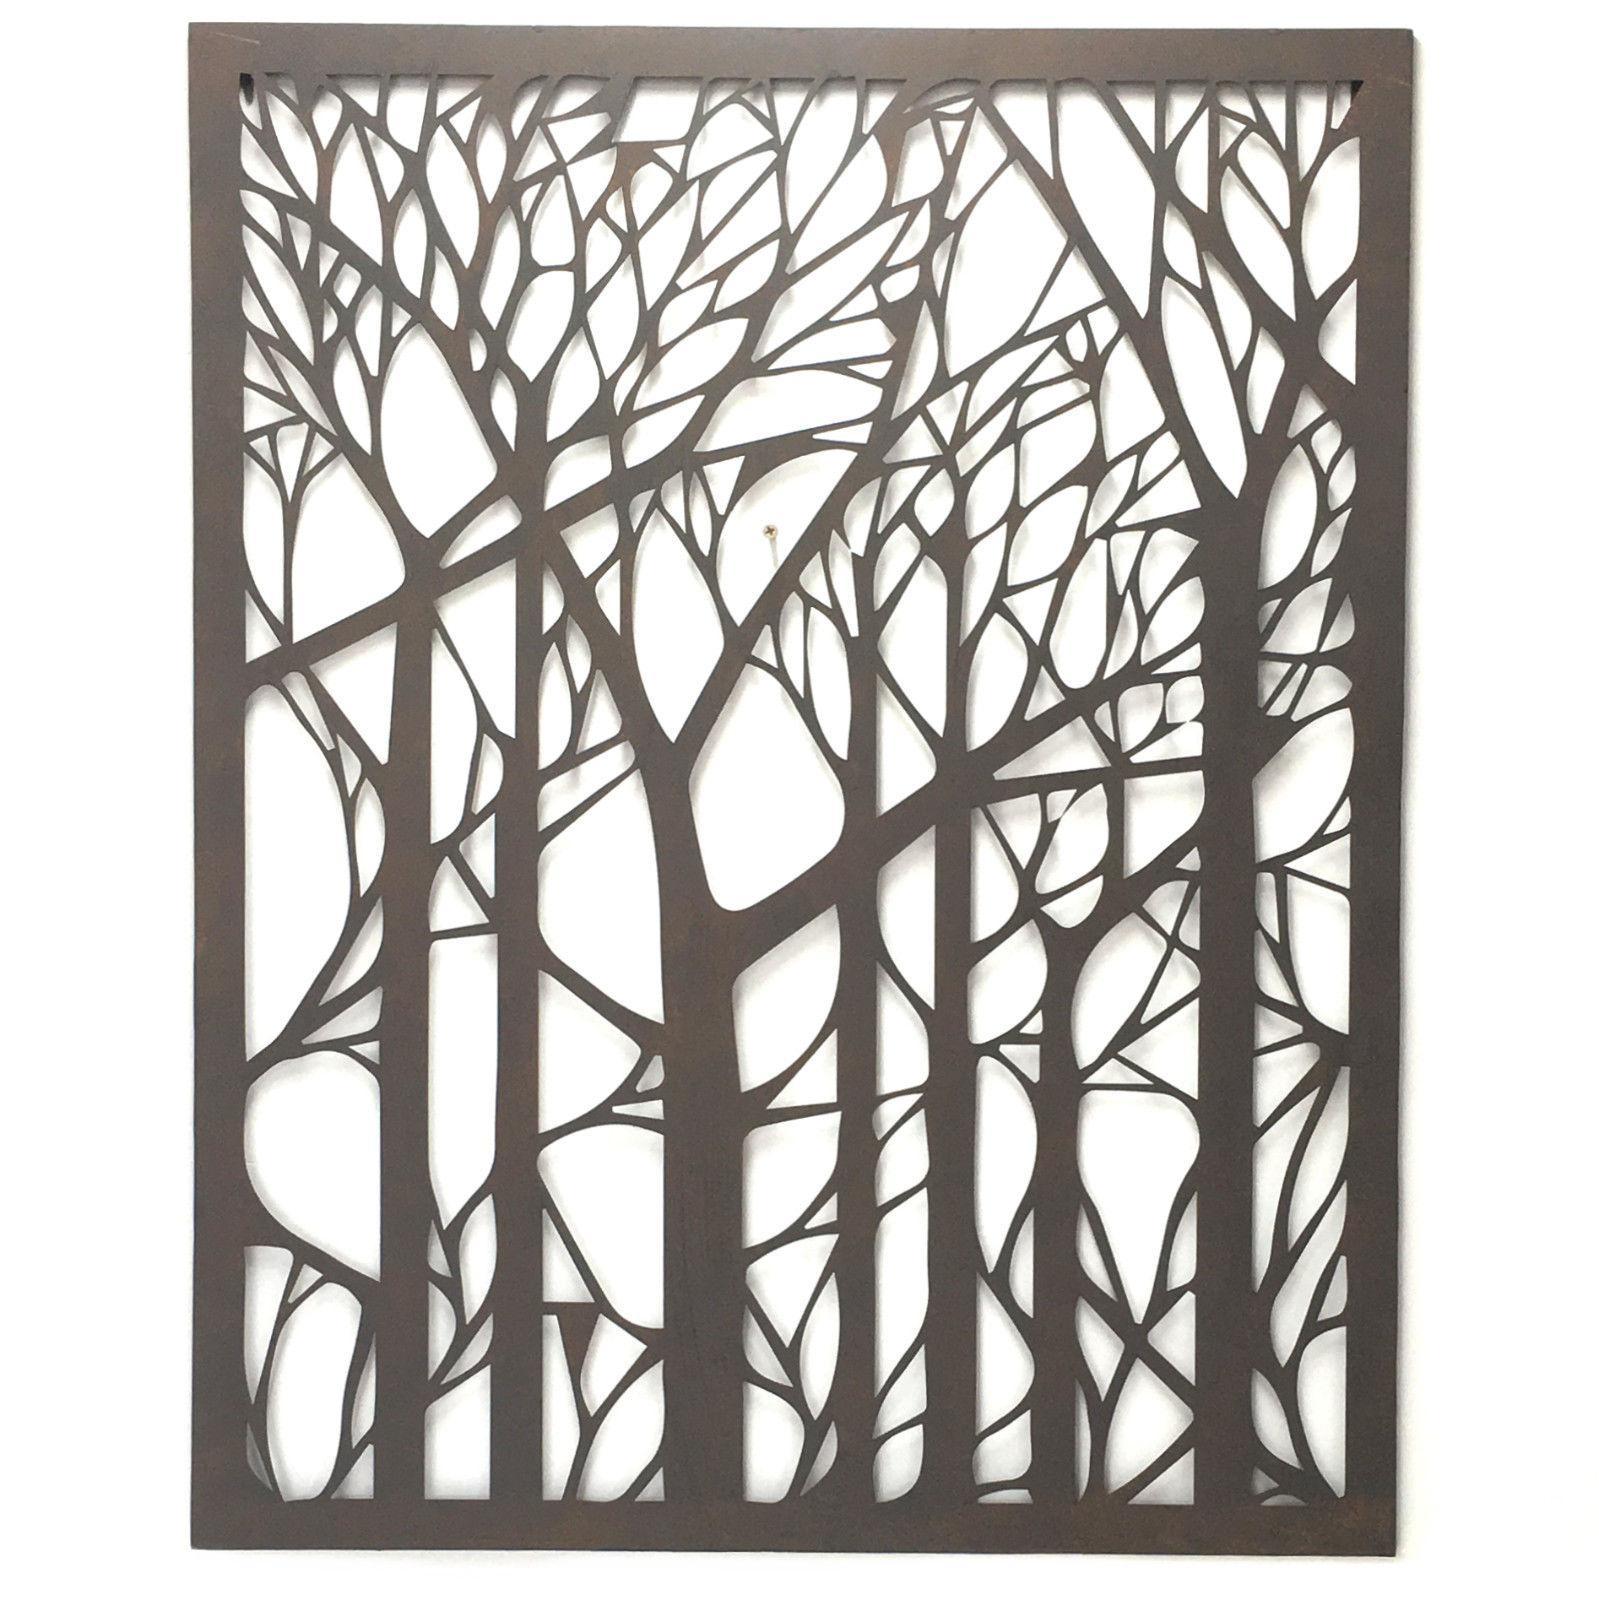 Wall Art Designs: Outdoor Wall Art Metal Tree Metal Wall Art Regarding Outdoor Wall Sculpture Art (View 13 of 20)